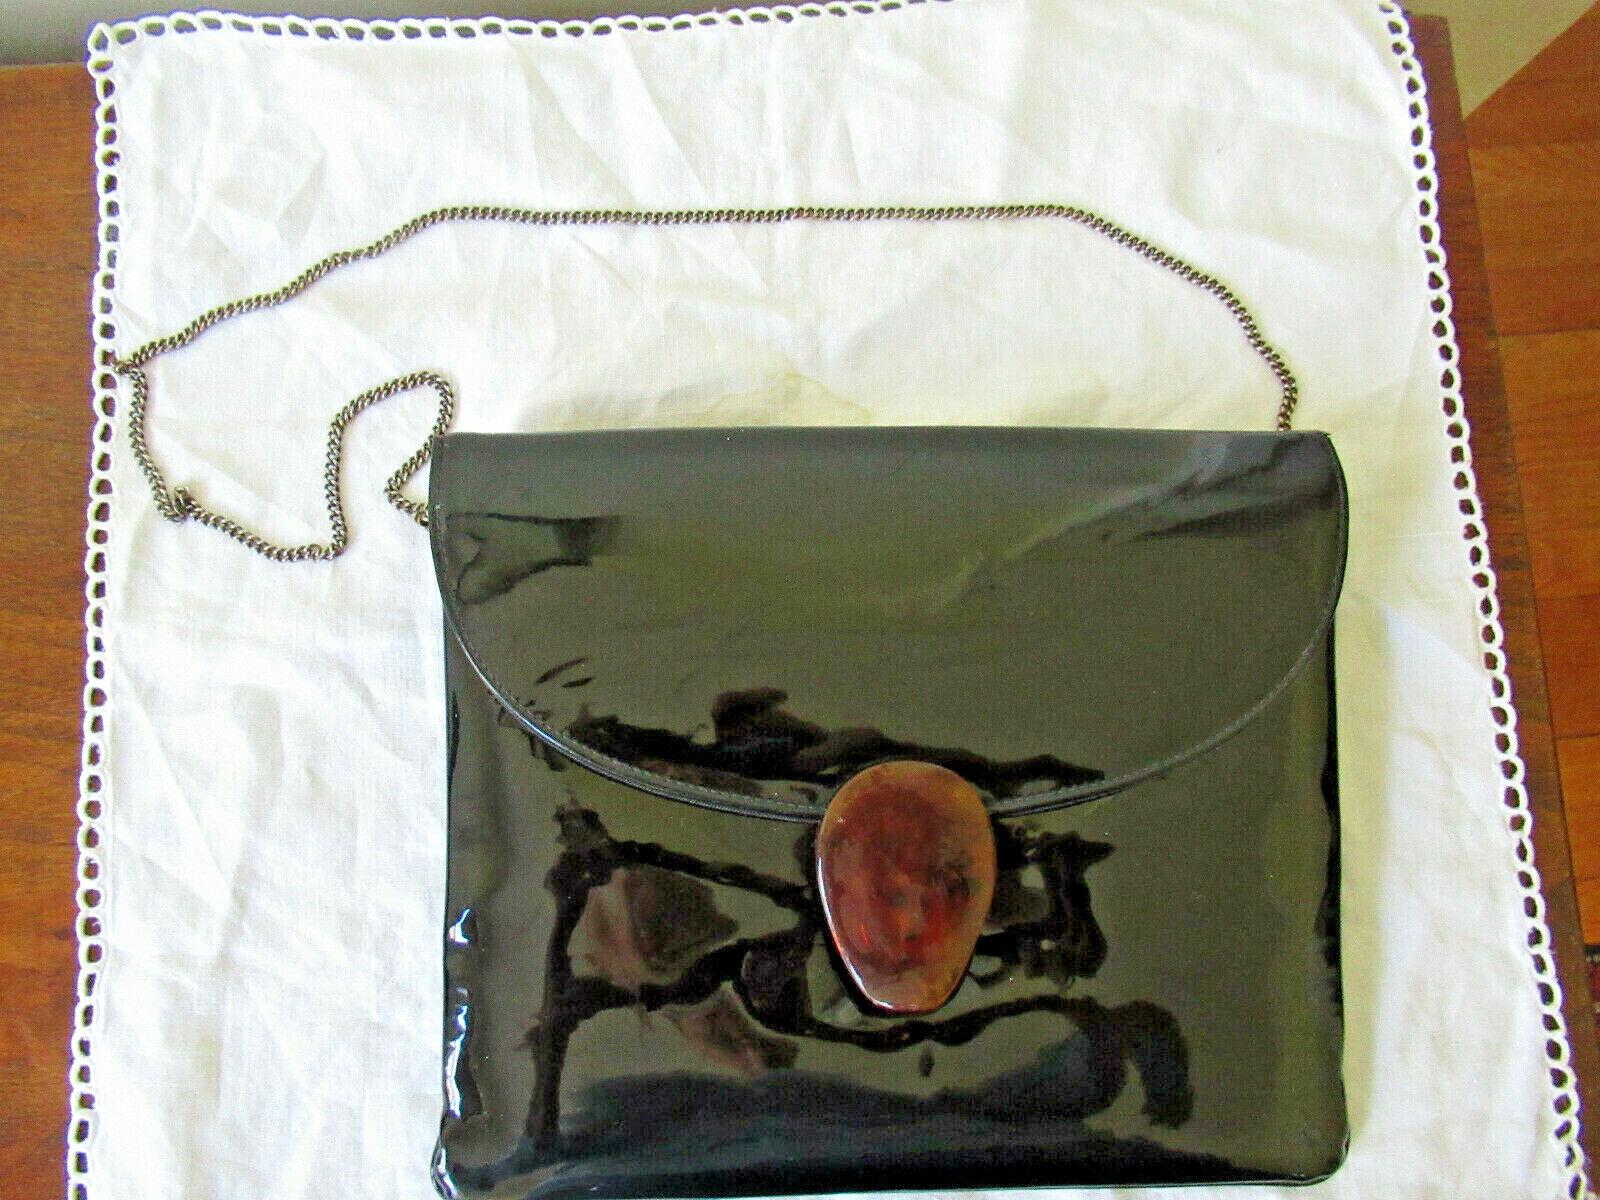 60'S VTG BLACK PATENT HANDBAG Purse Tortoise Shell Clasp Bakelite? Metal Chain